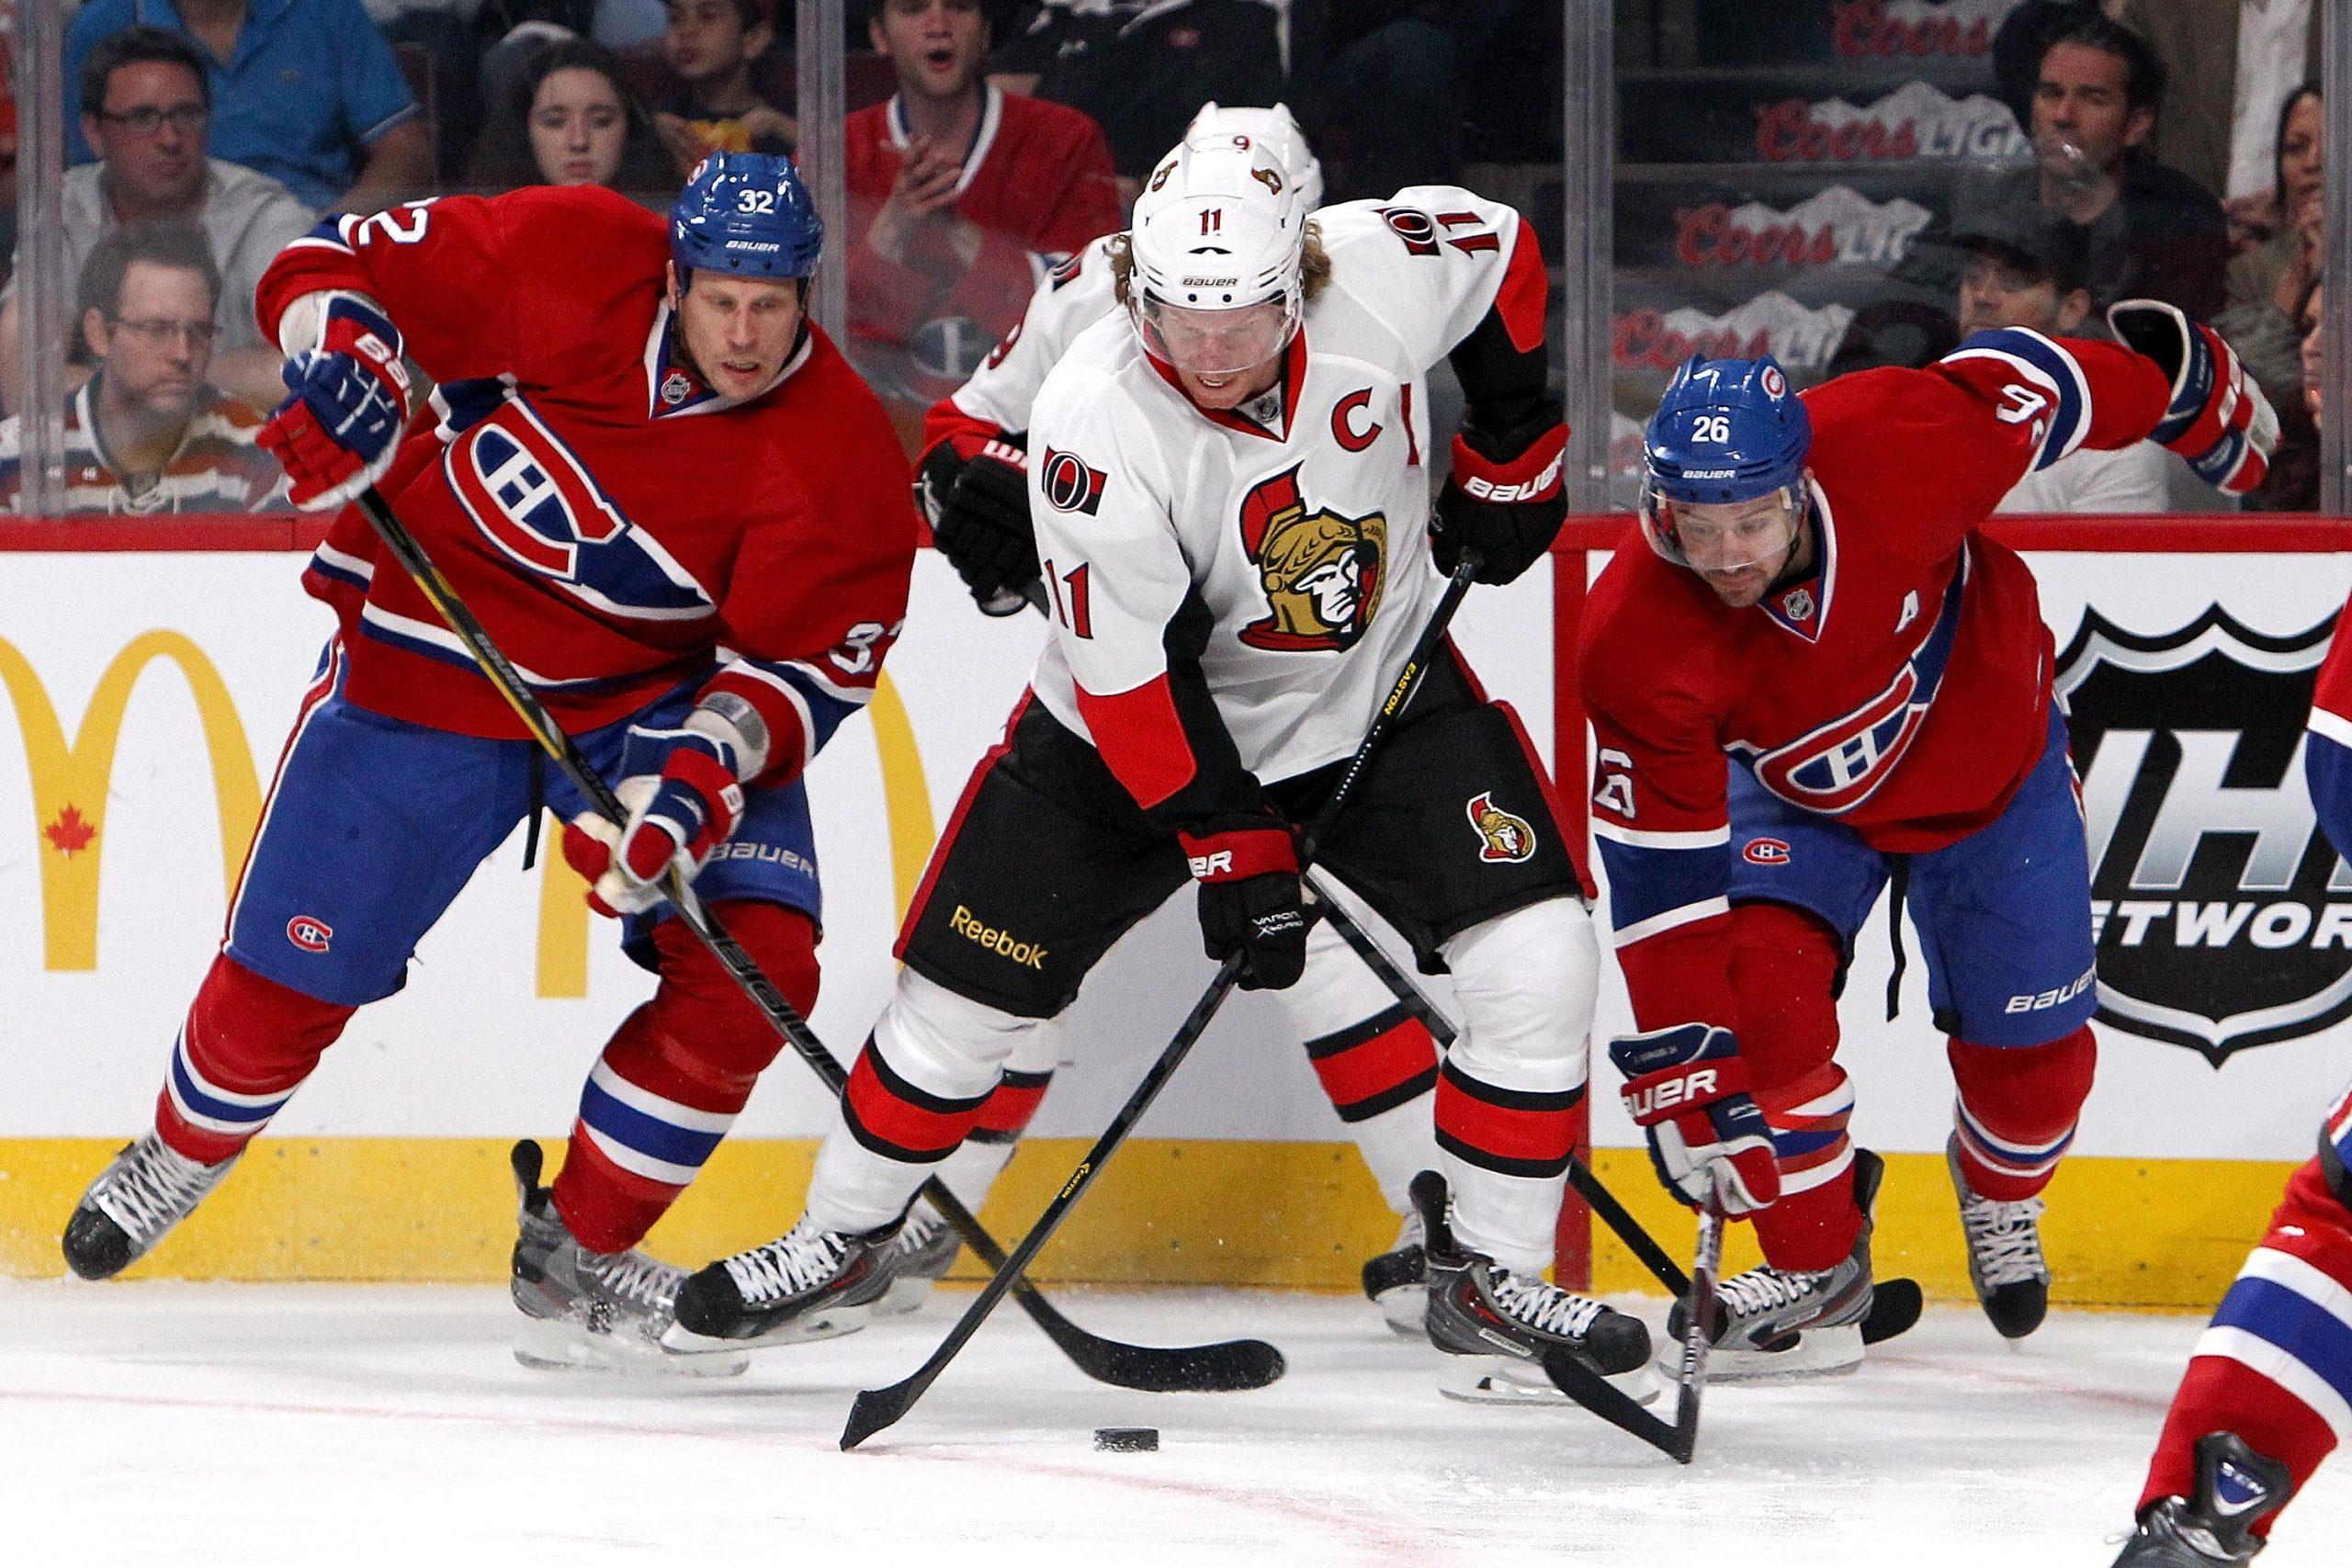 Монреаль — Оттава. Прогноз на 5 декабря 2018. НХЛ